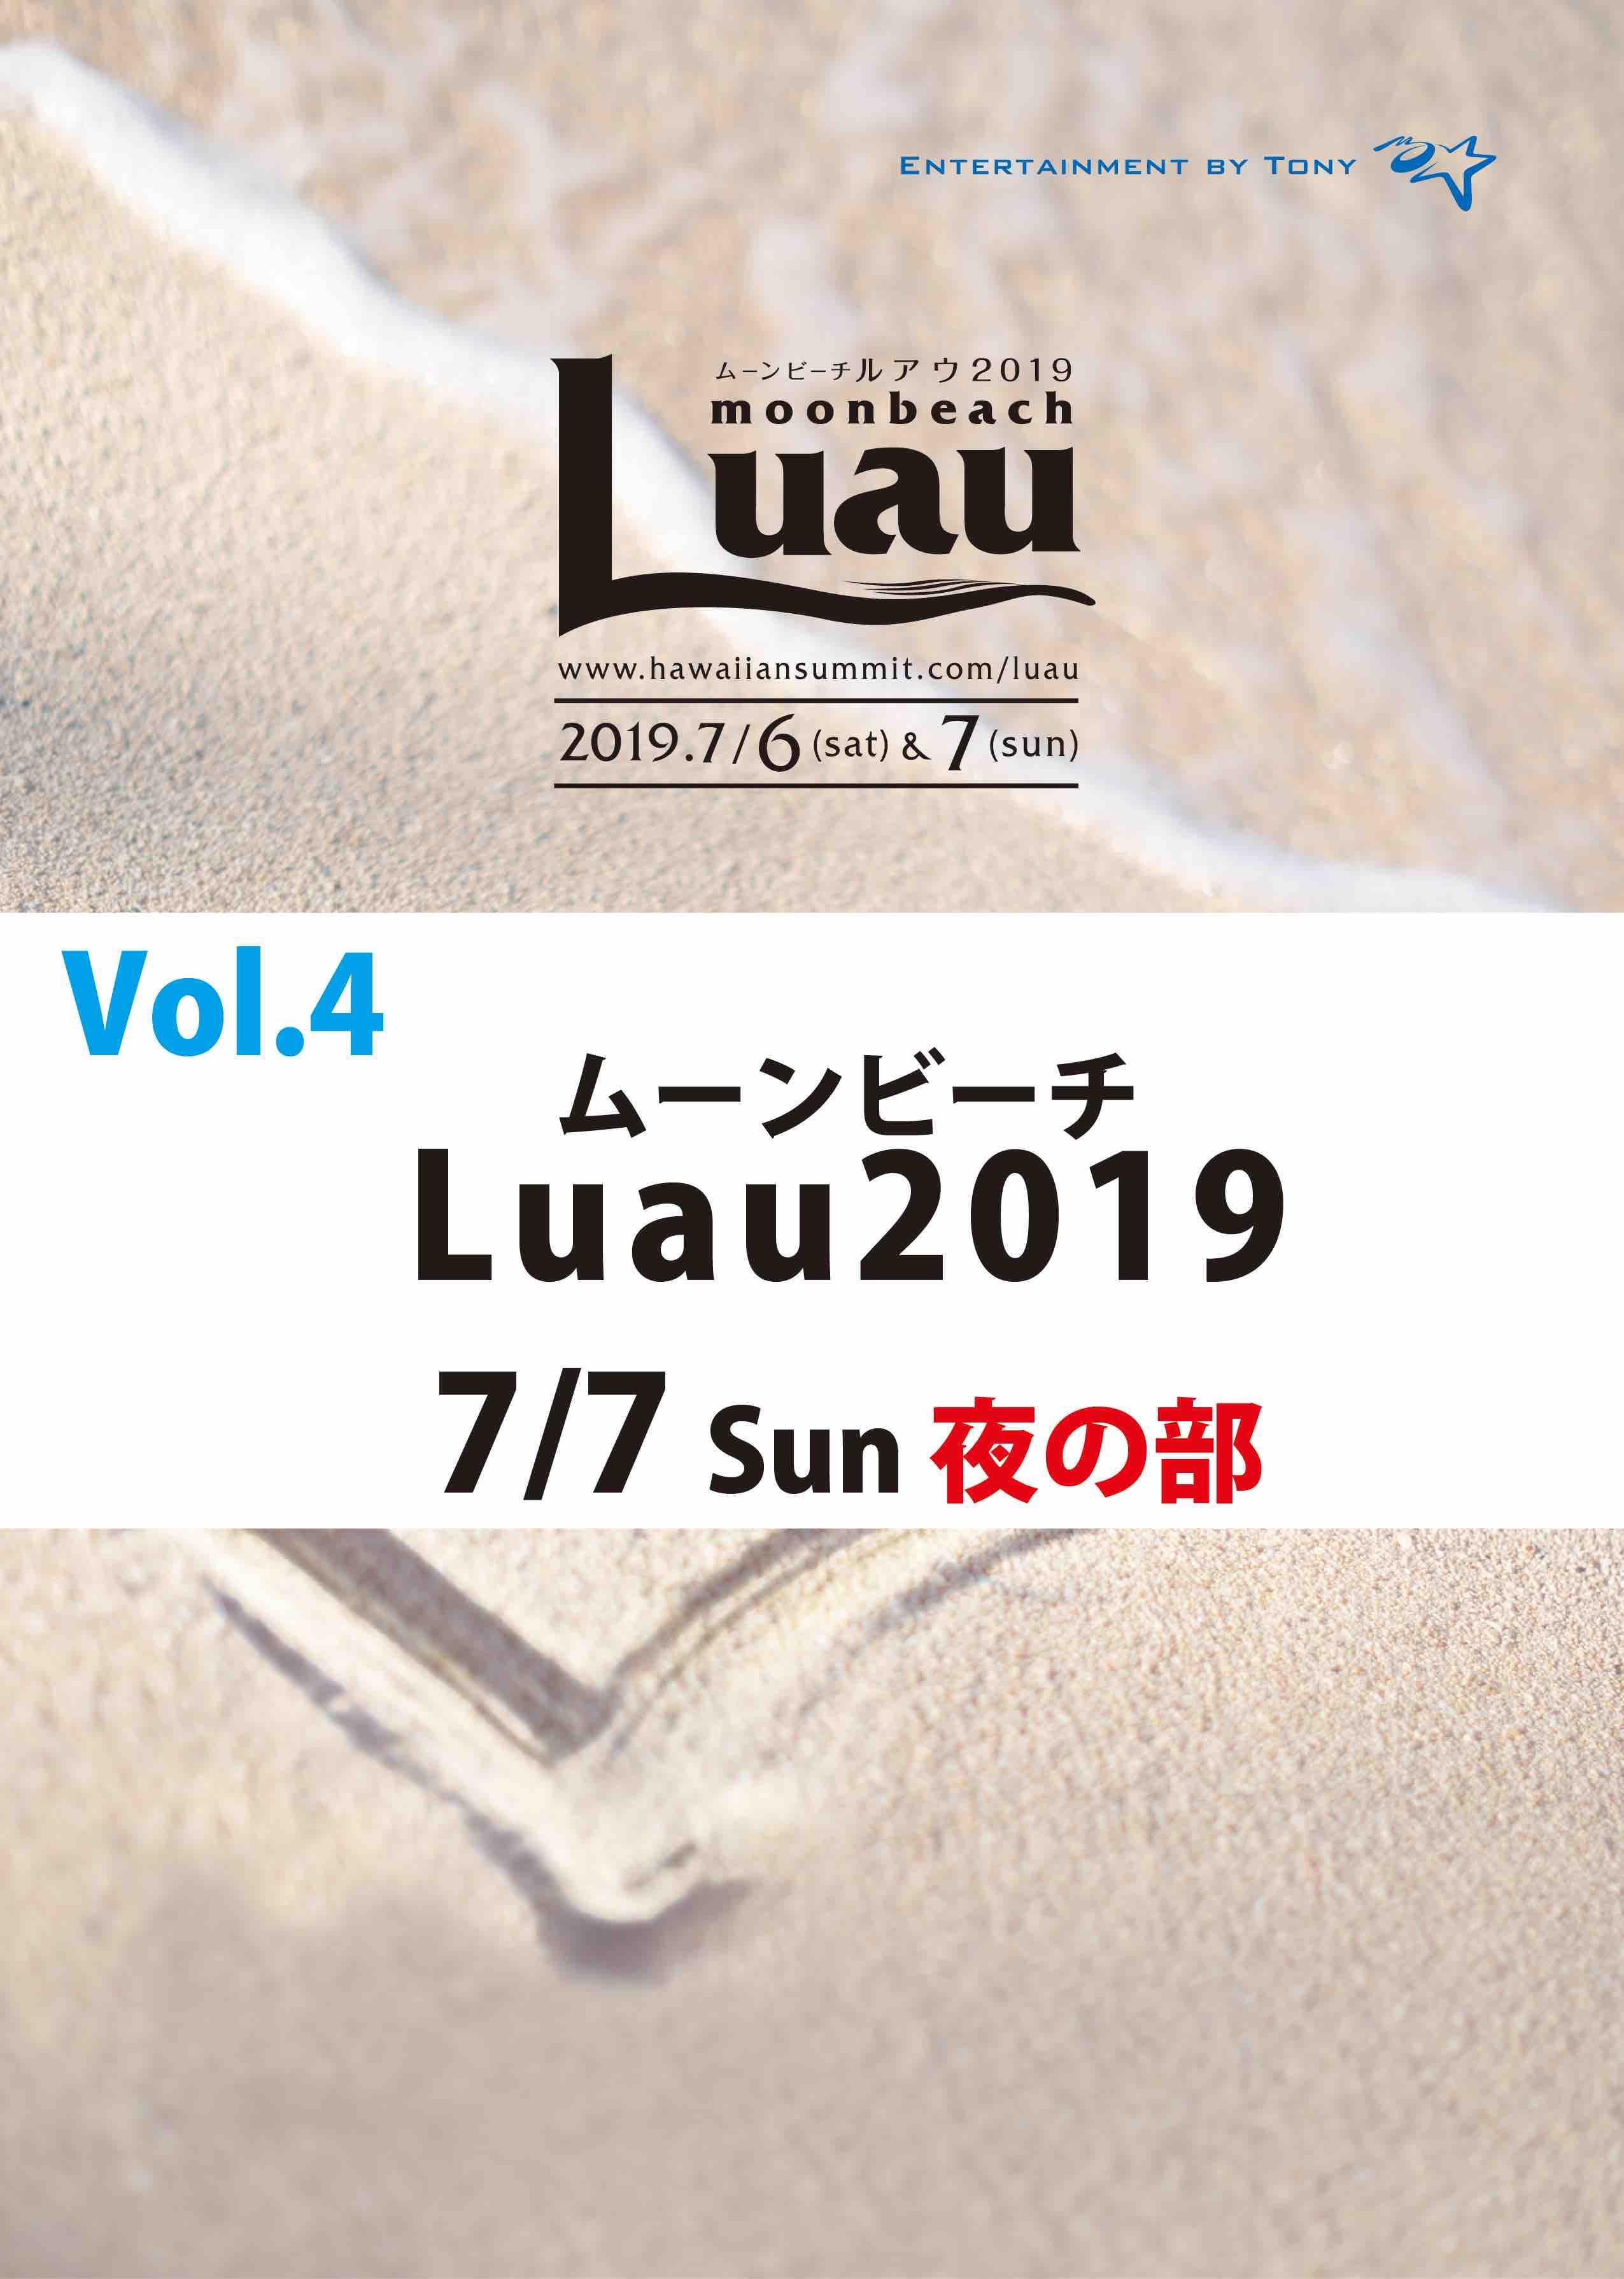 Luau2019 Vol.4 (7月7日 ビーチステージ)DVD